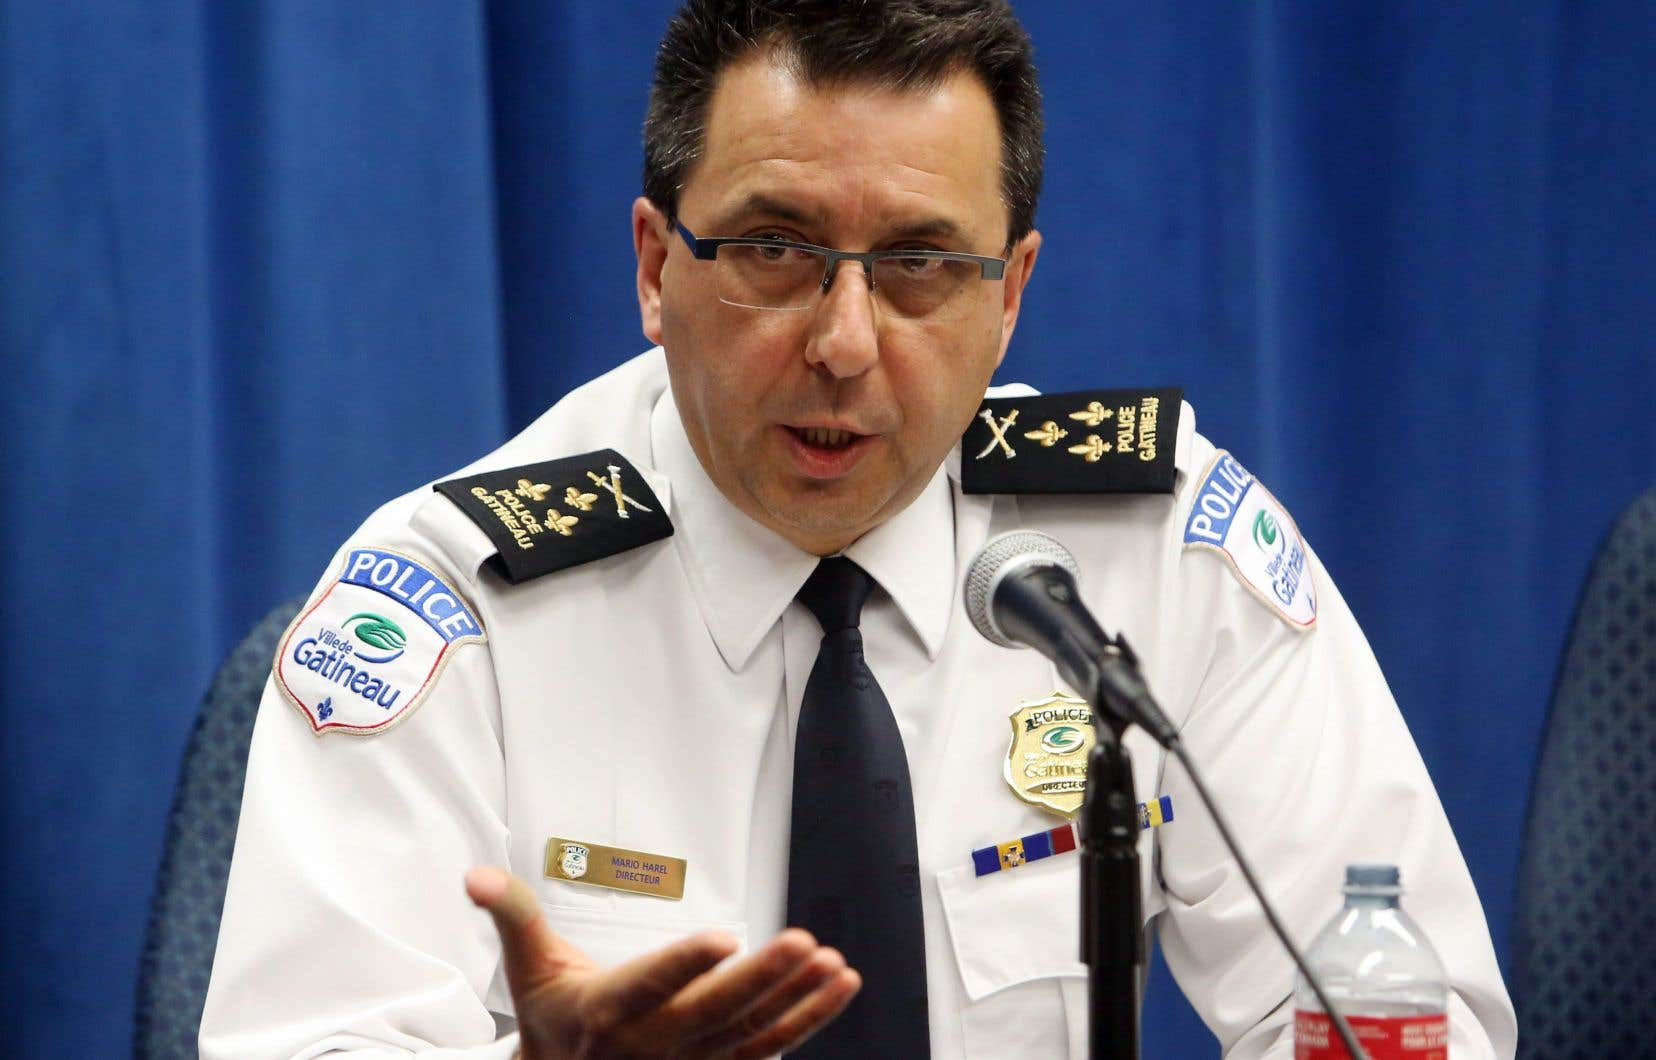 Le directeur du service de police de Gatineau, Mario Harel